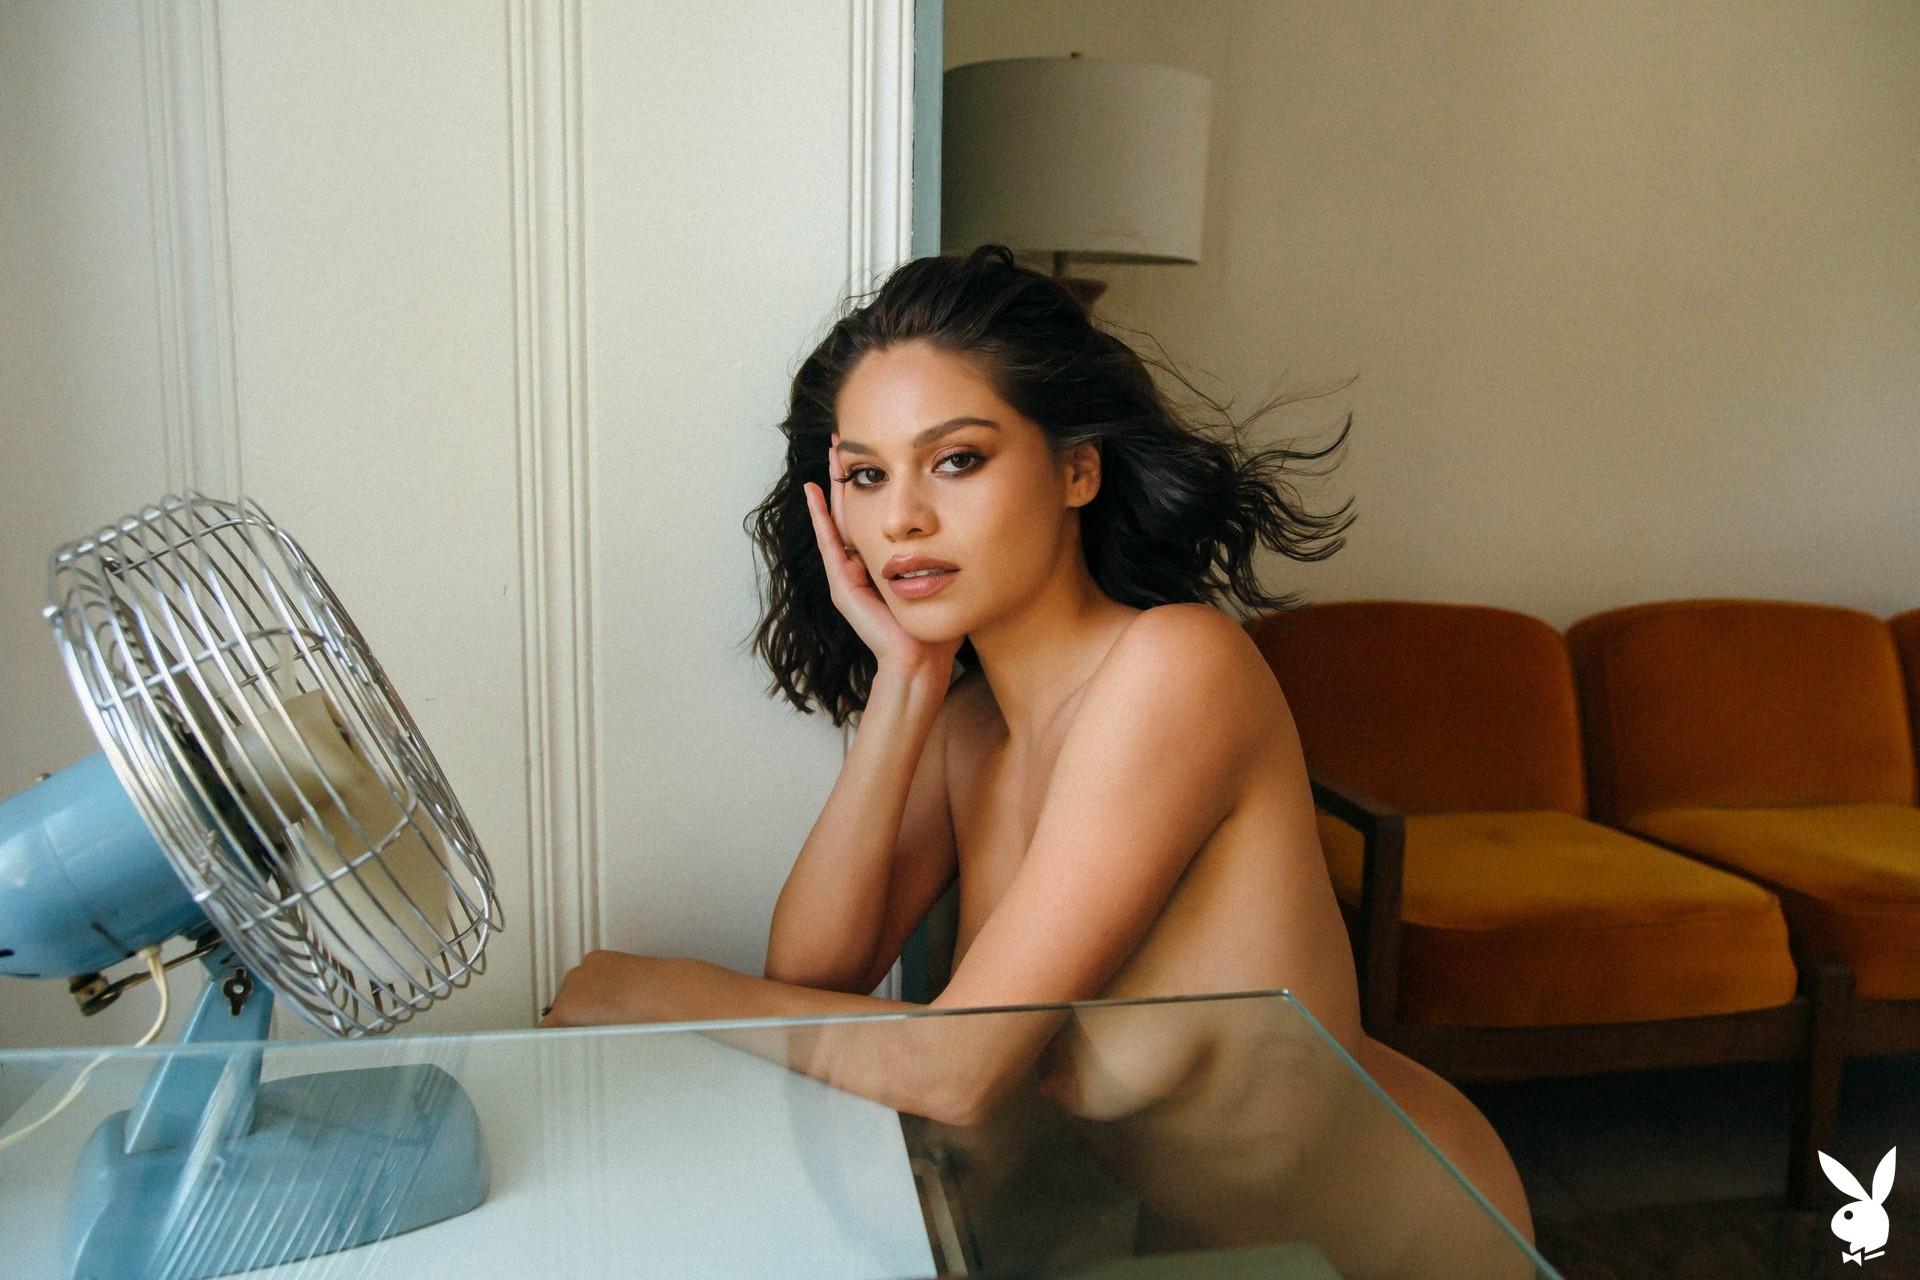 Natalie Del Real In The Simple Things Playboy Plus (29)